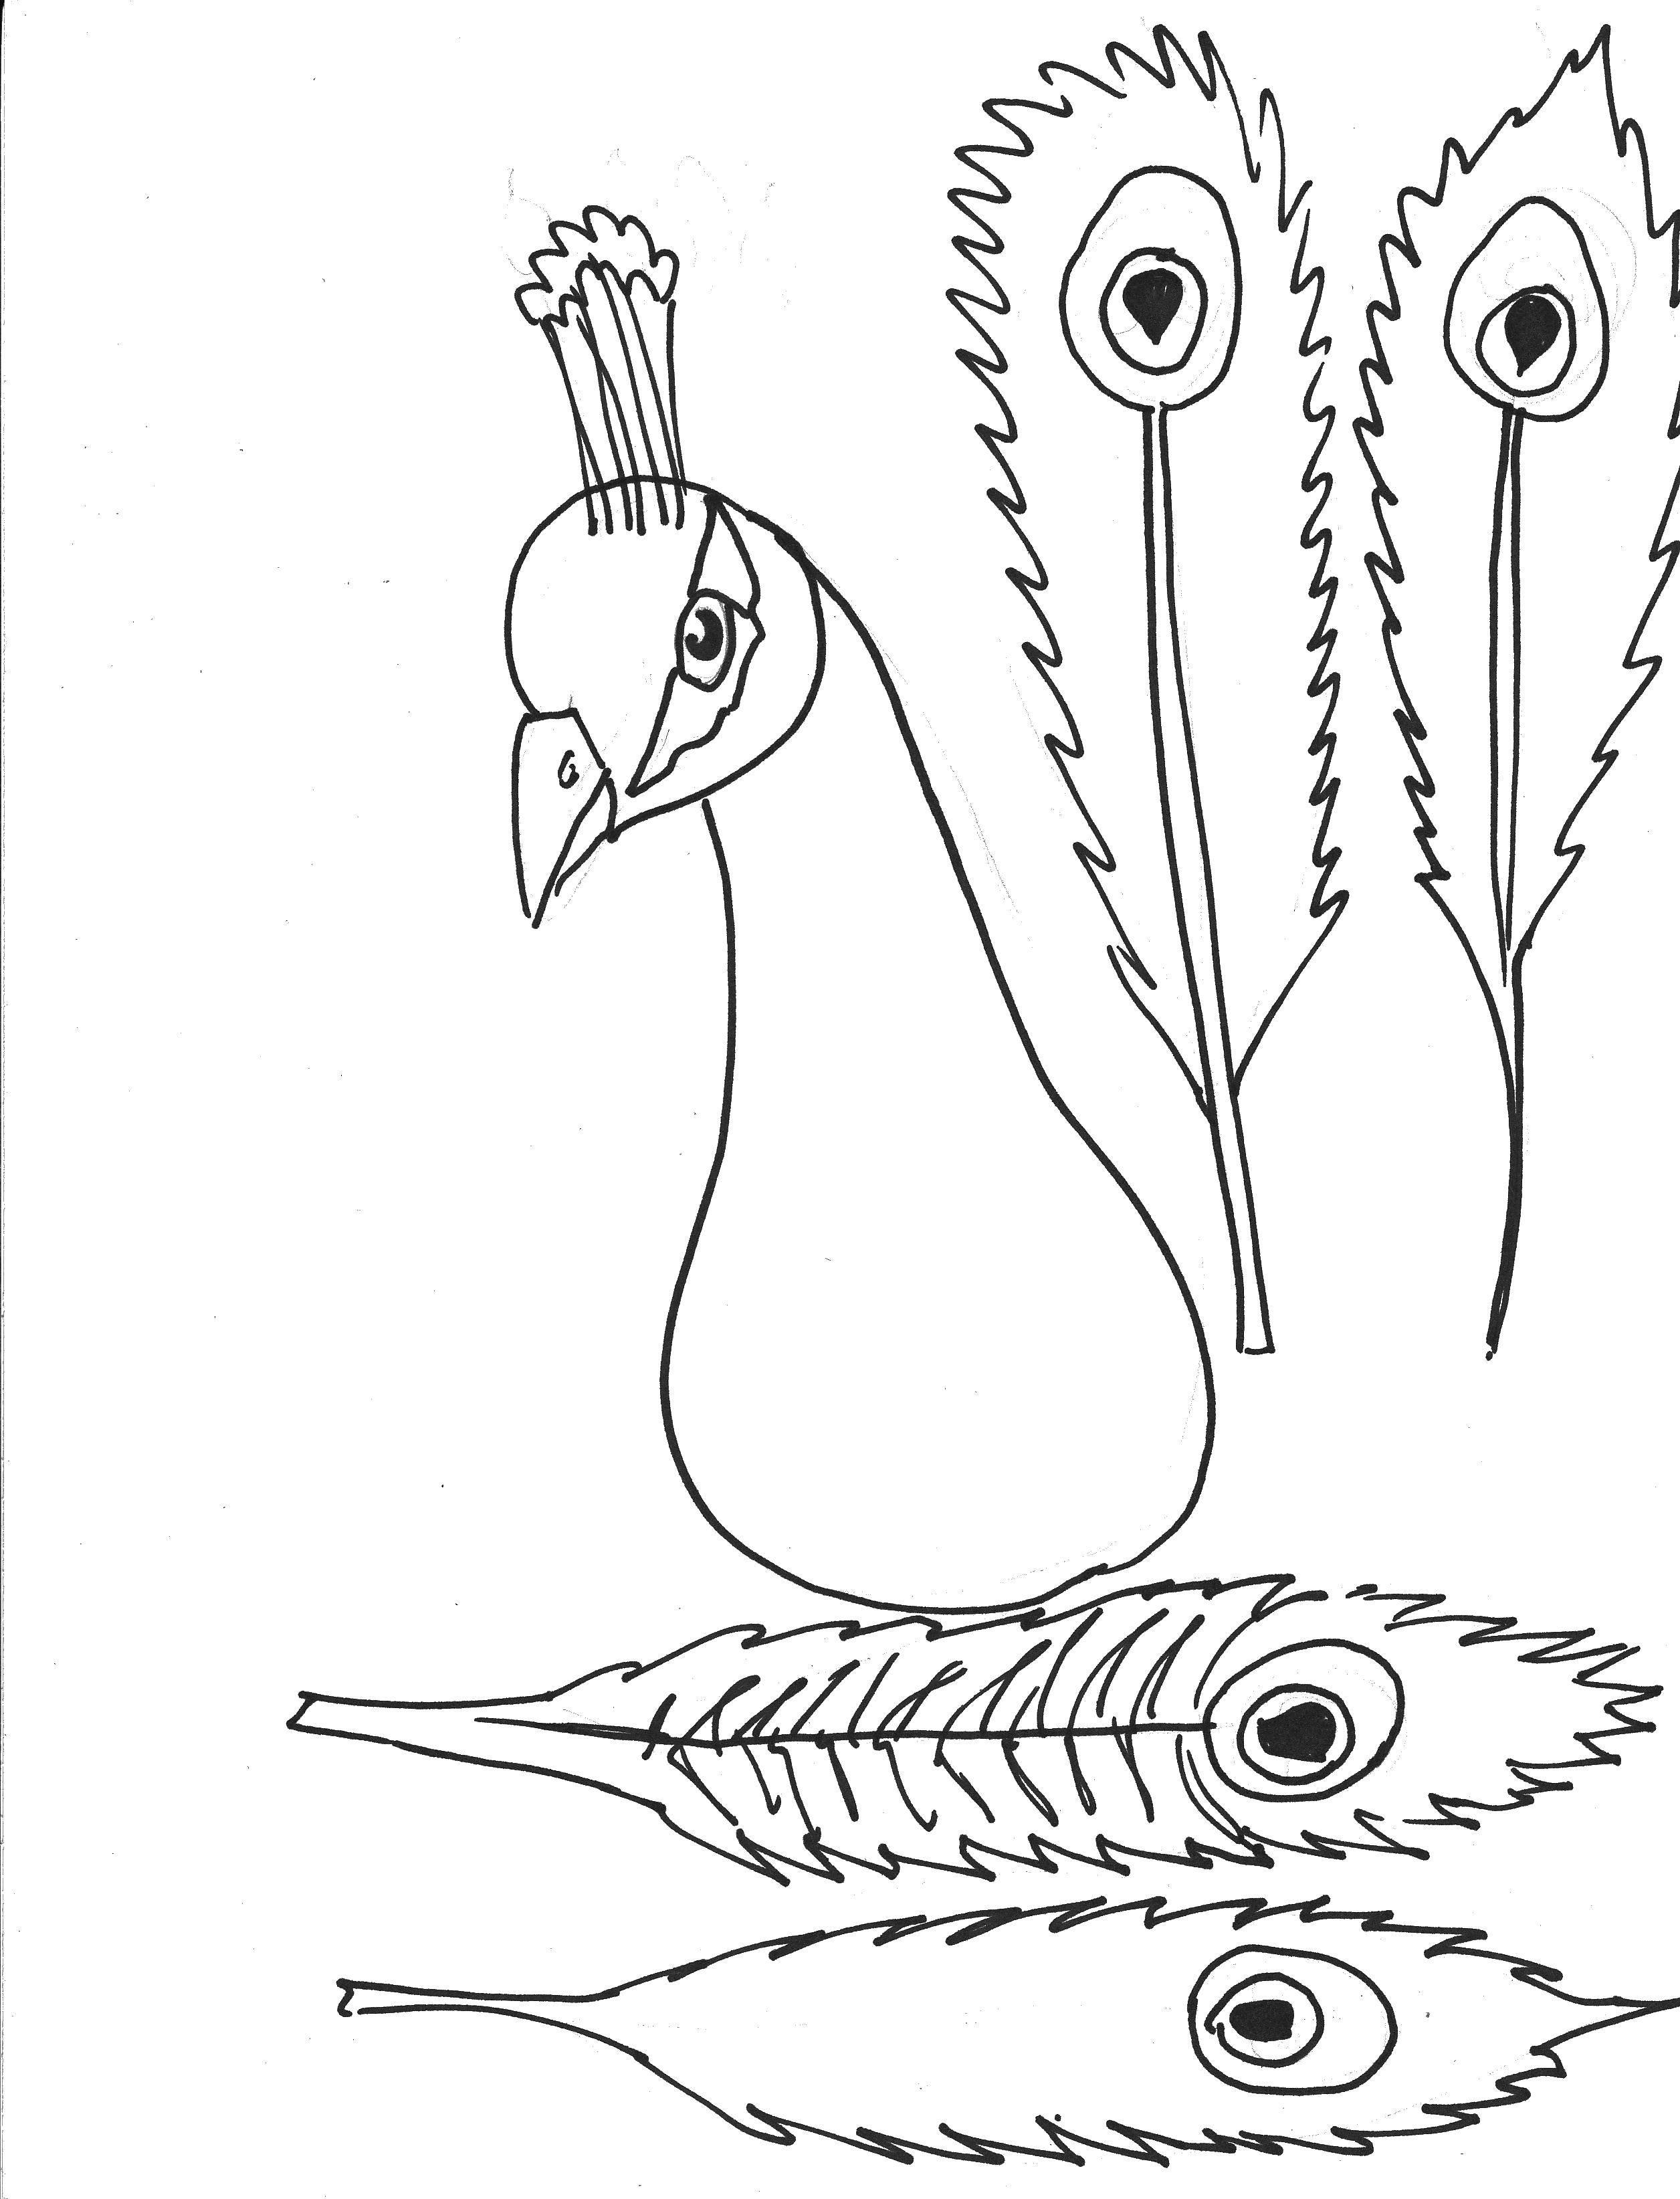 выколотки жар-птица без хвоста картинки раскраски эти